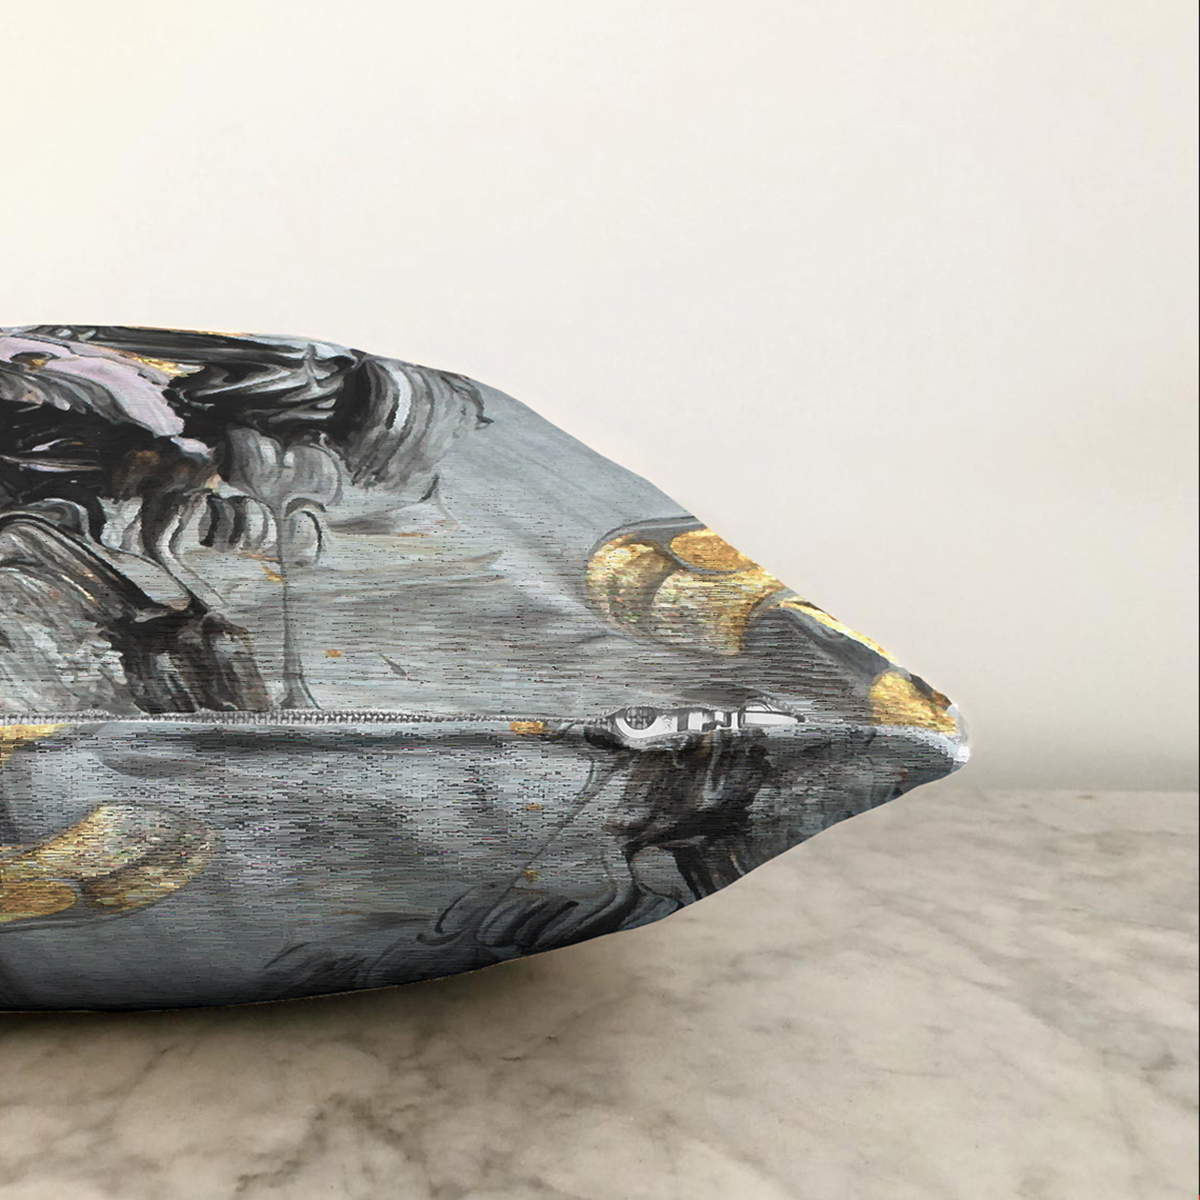 Çift Taraflı Gold Detaylı Siyah Renkli Dijital Baskılı Modern Şönil Yastık Kırlent Kılıfı Realhomes